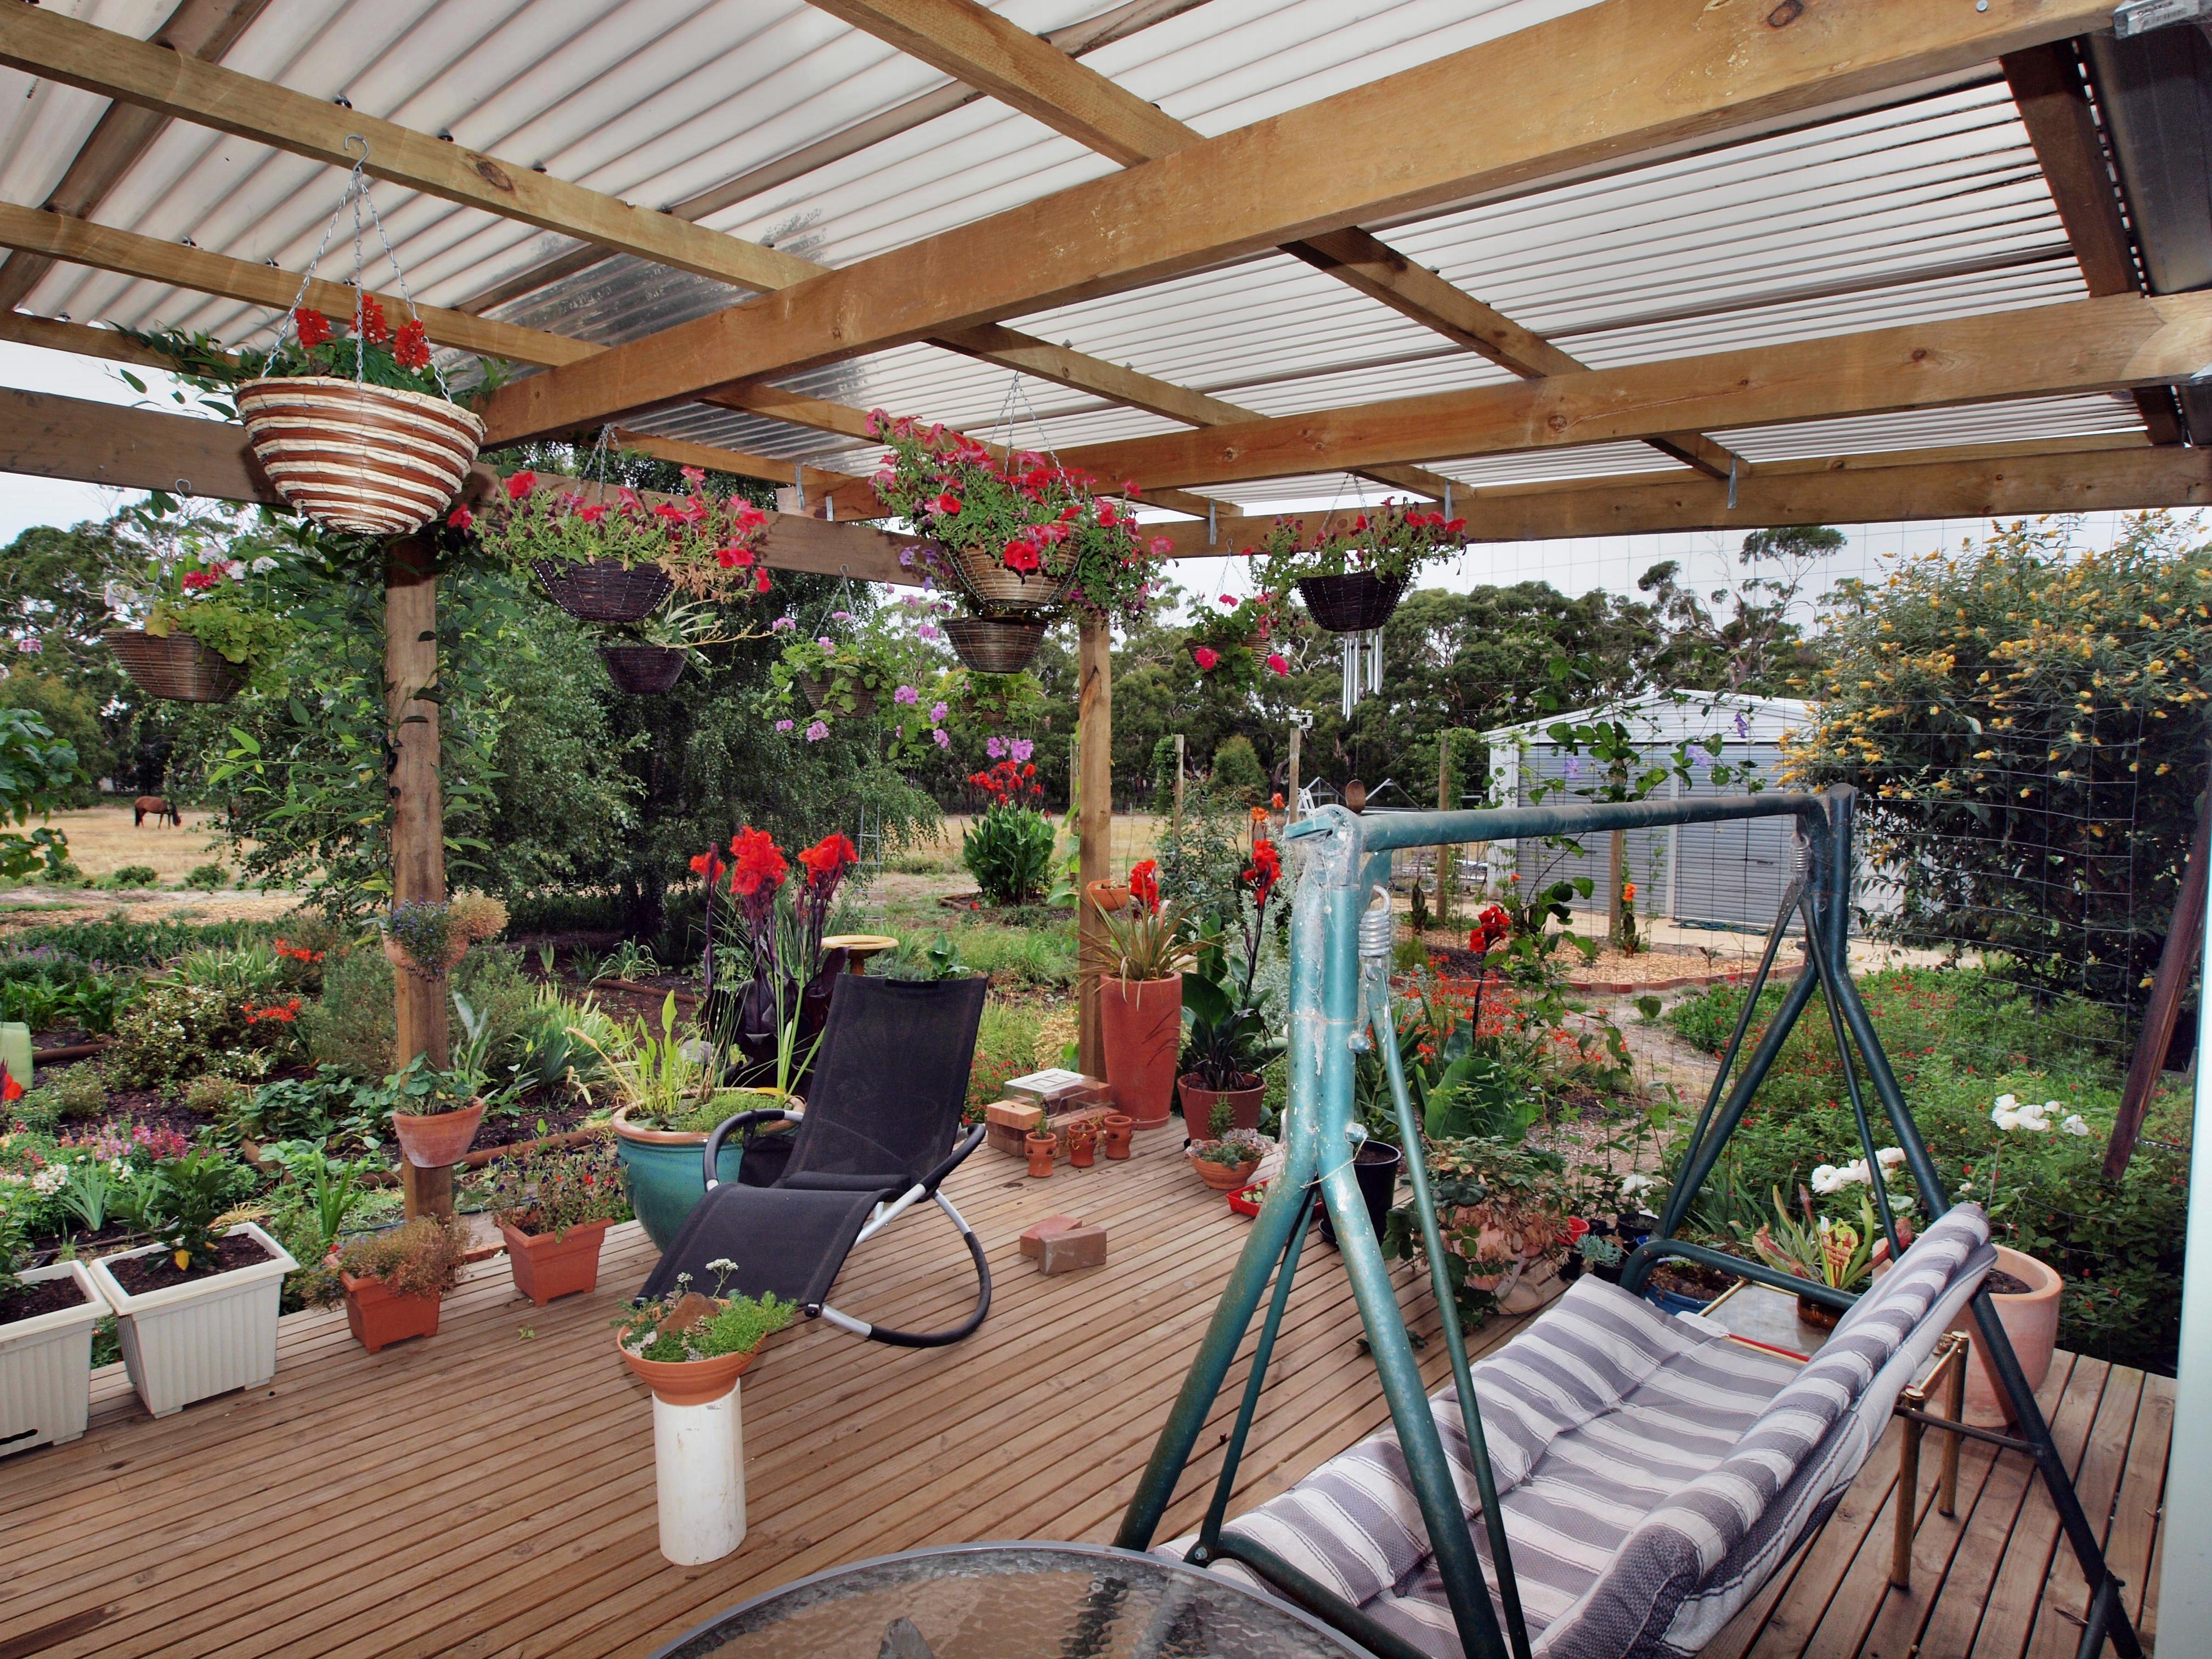 verandah-5-10mm.jpeg